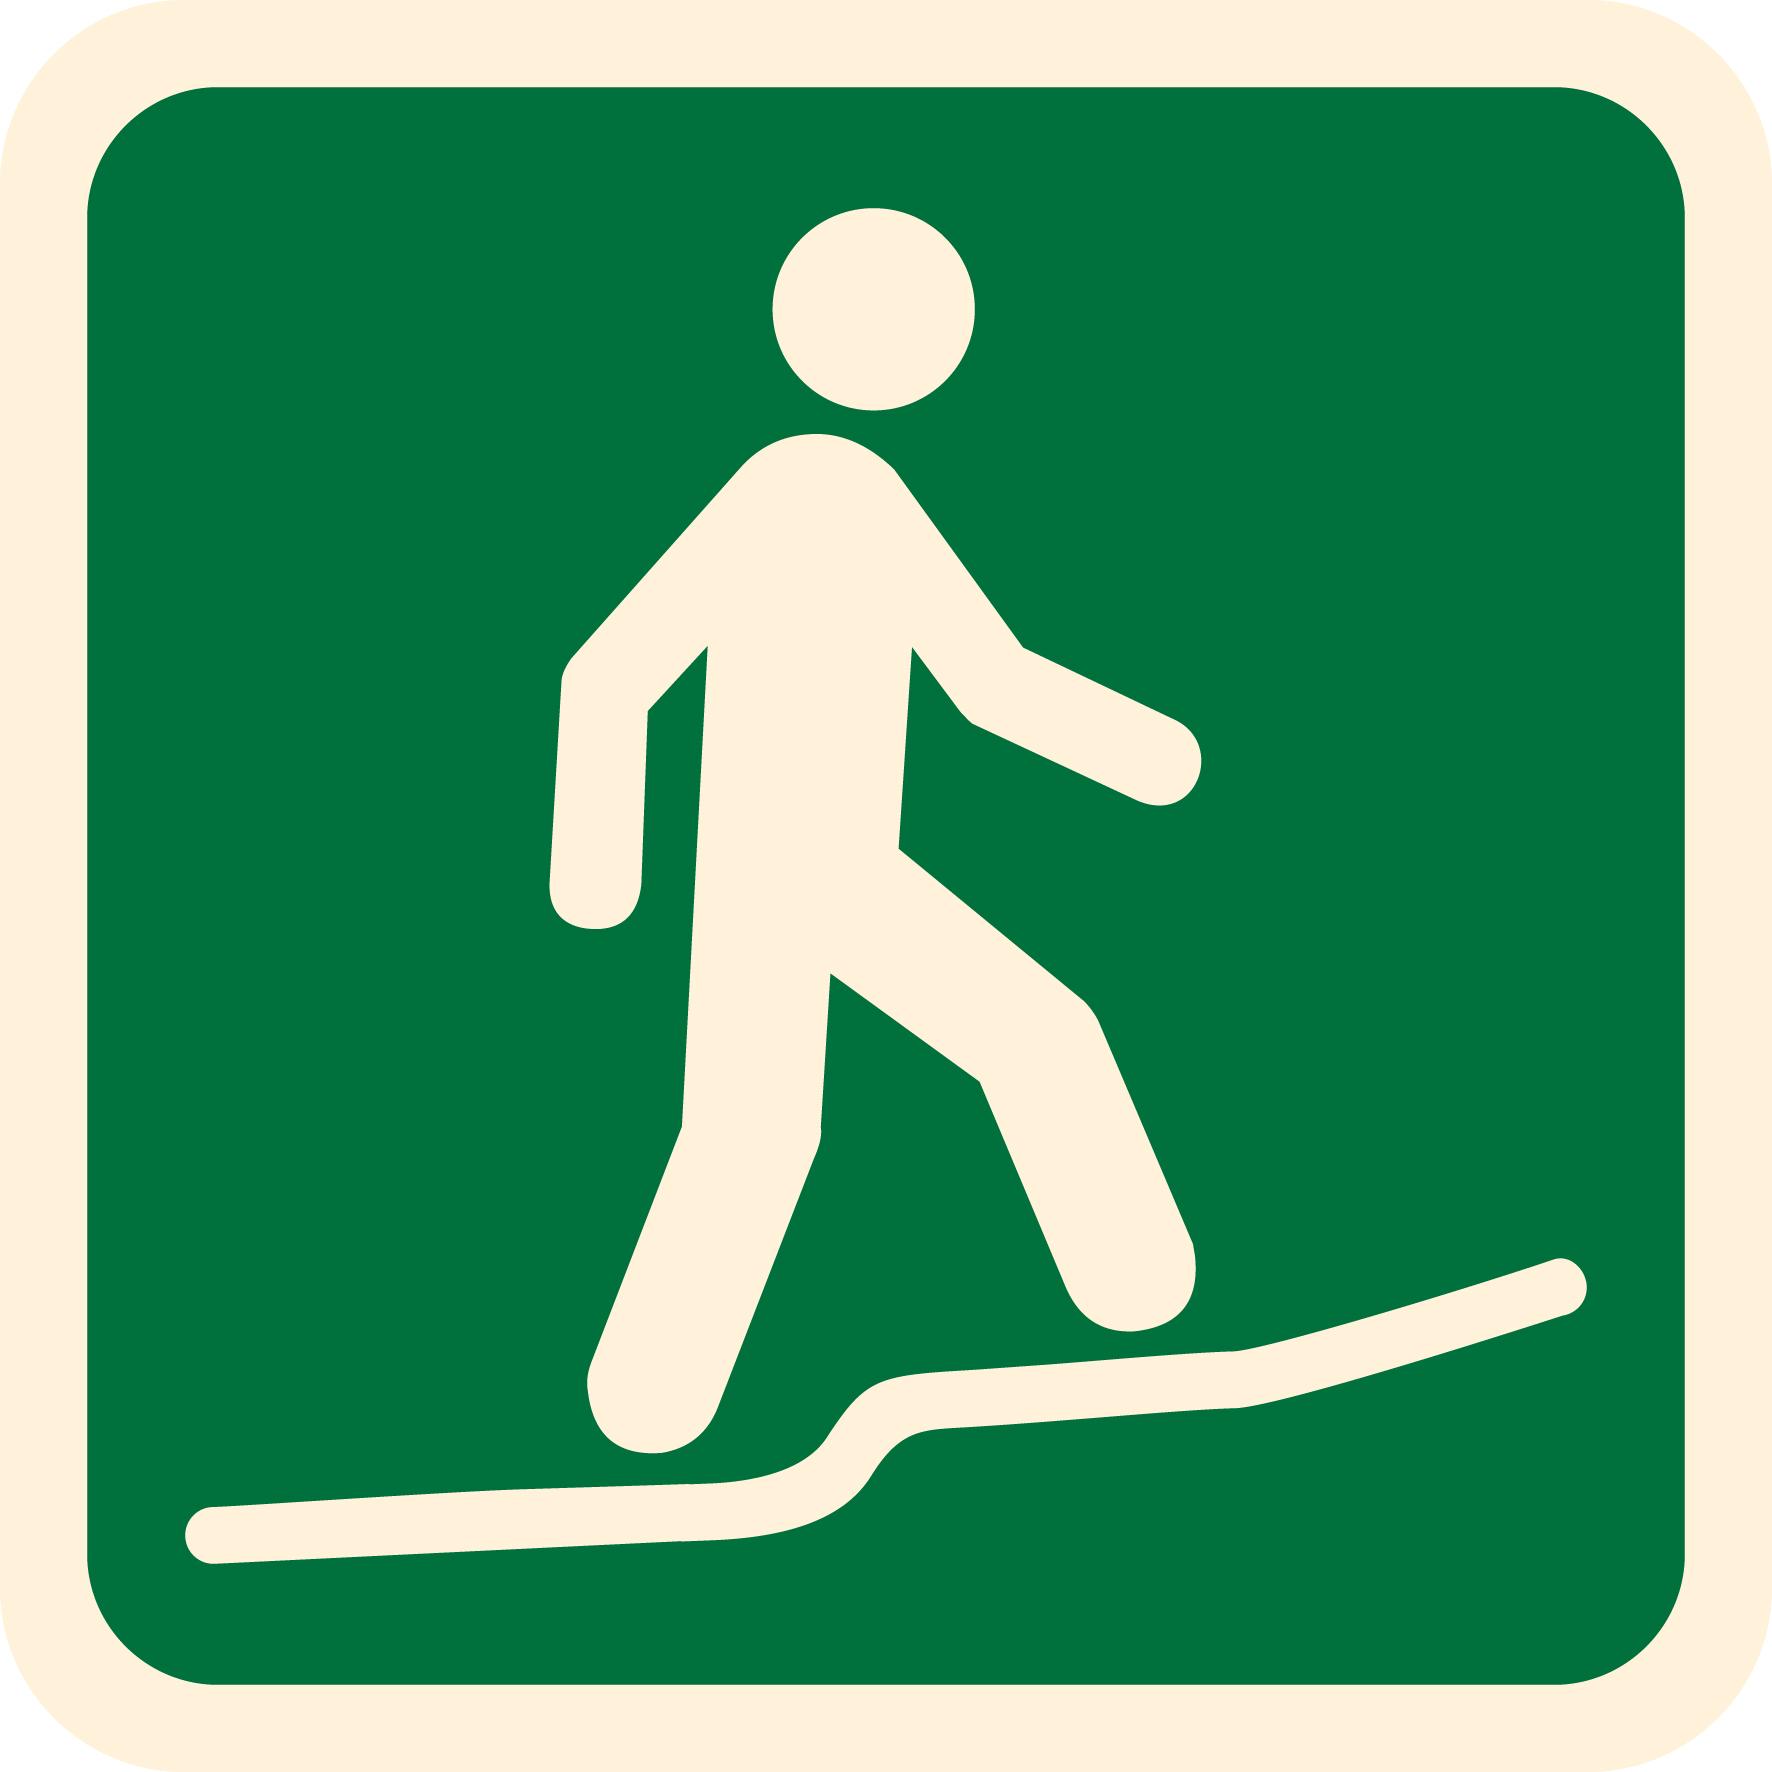 Walk Symbol